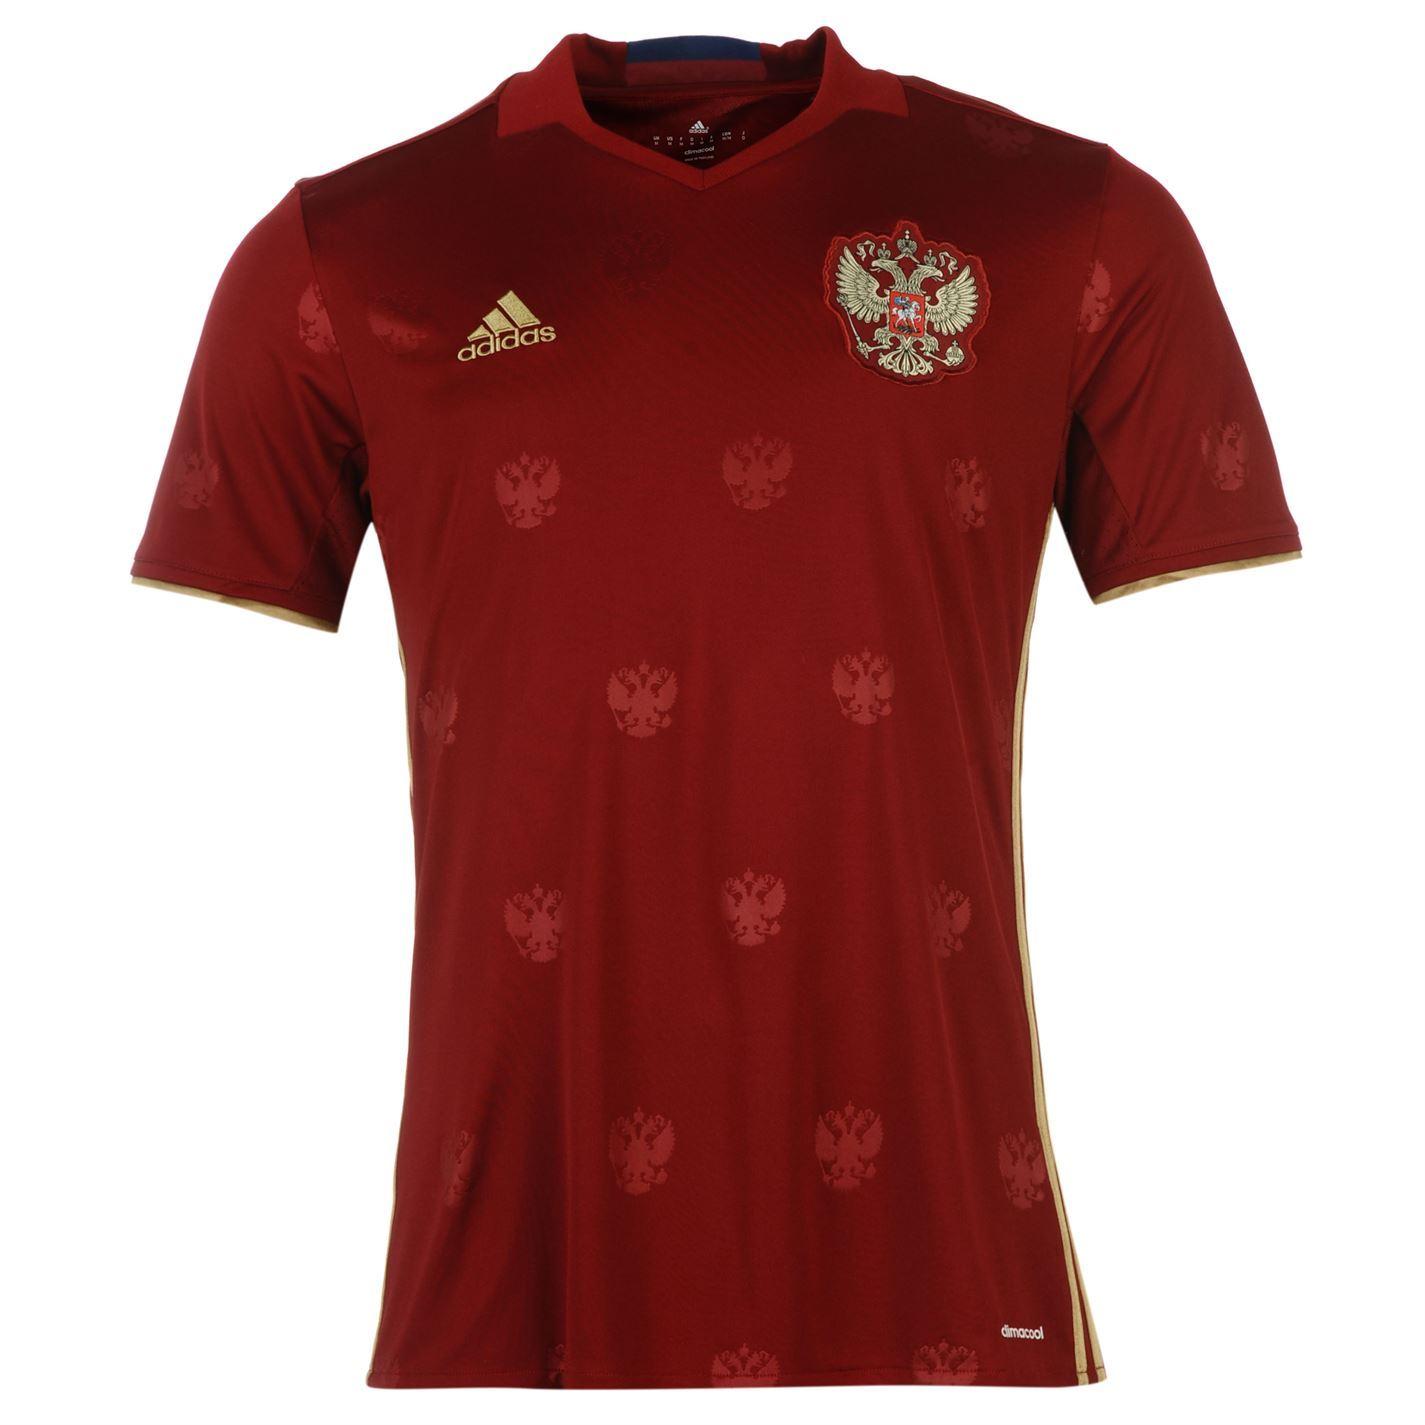 Adidas Russia Home Jersey 2016 Mens Burgundy Football